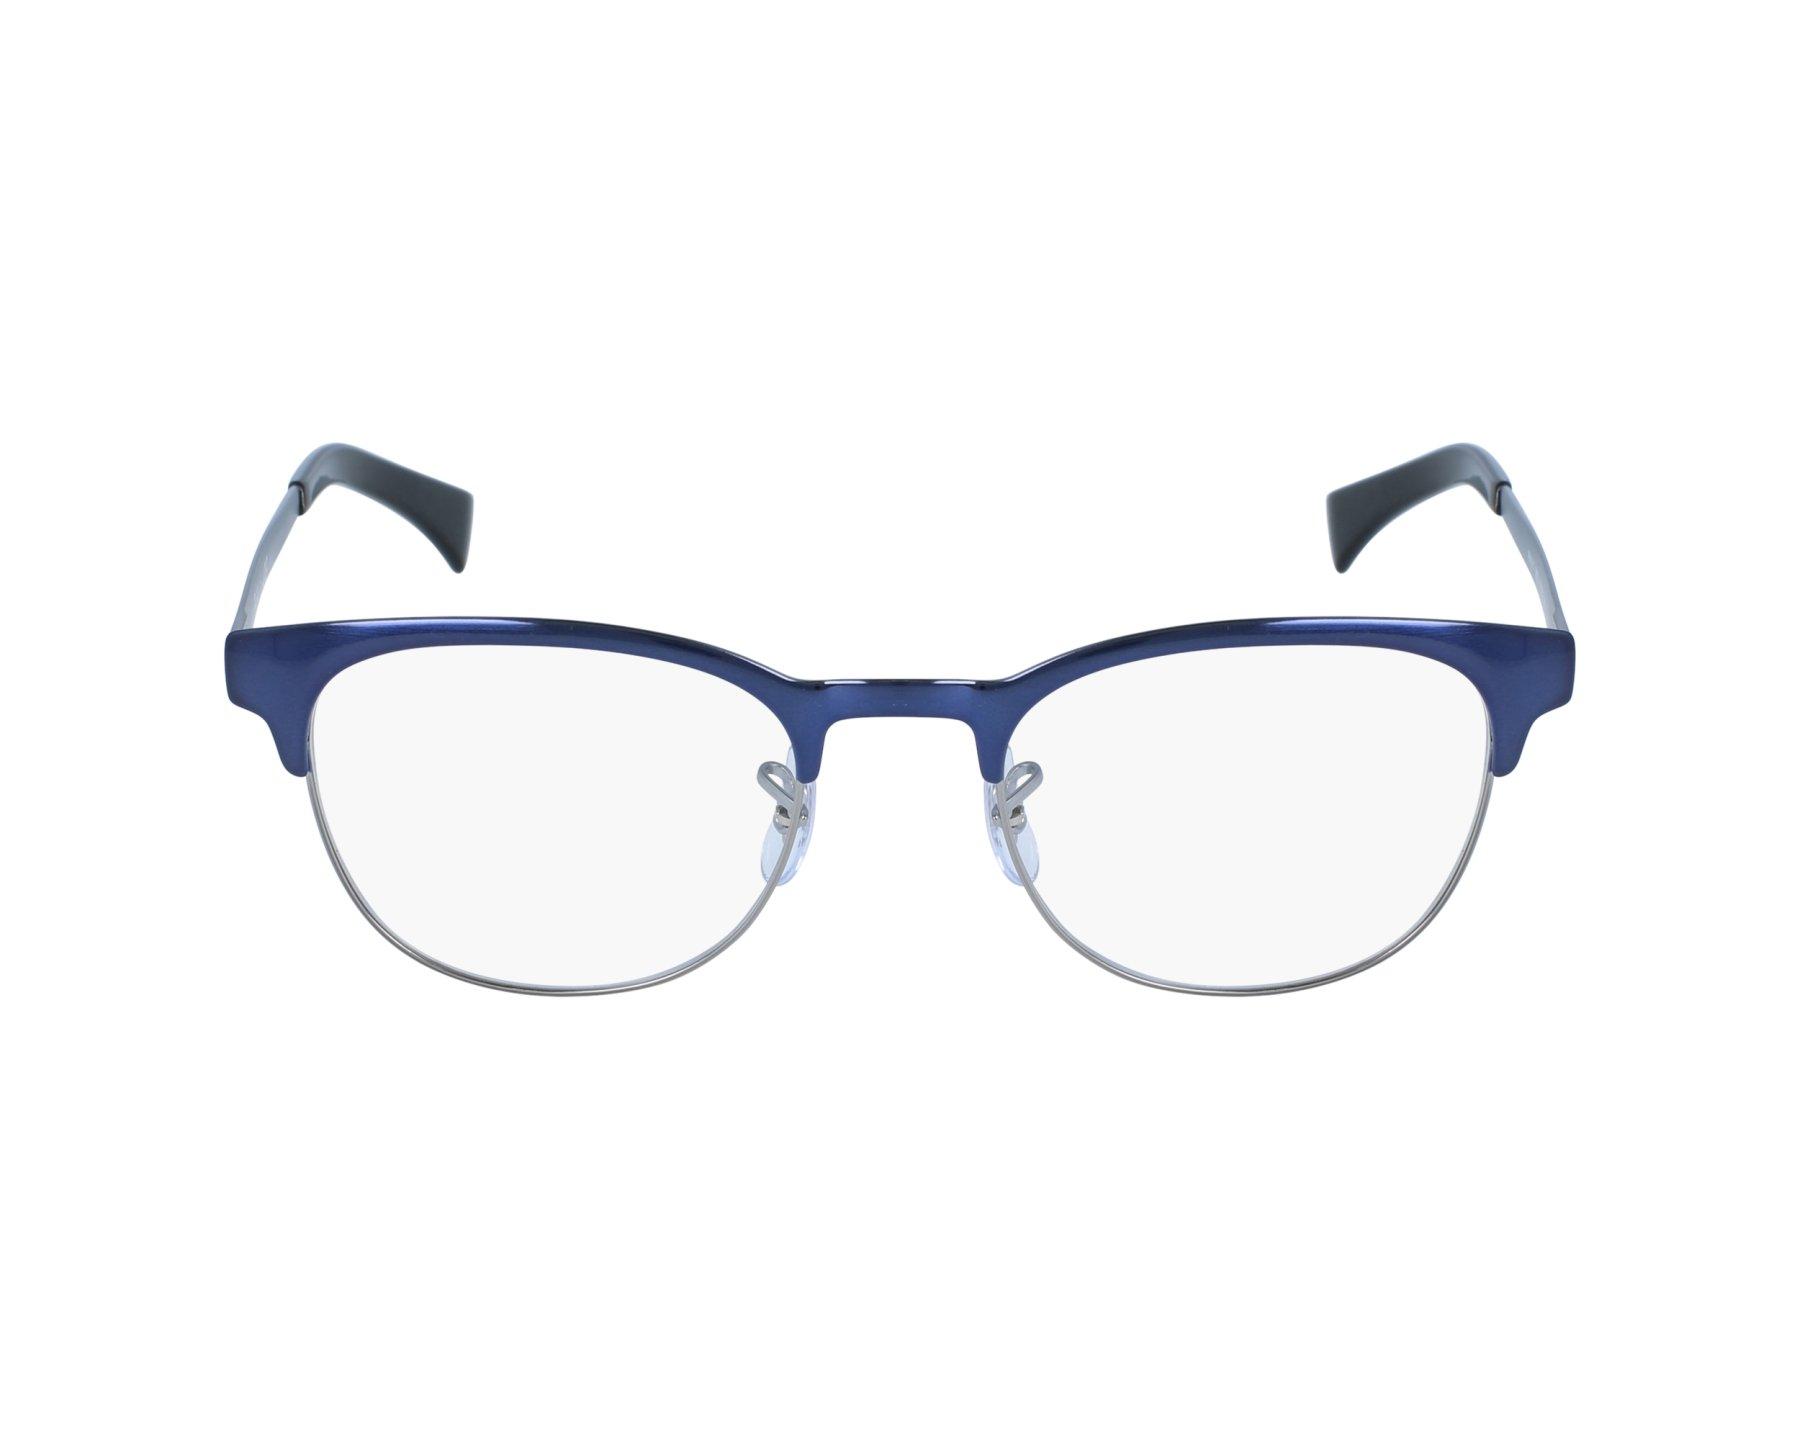 099f82825fbb eyeglasses Ray-Ban RX-6317 2863 49-20 Blue Silver profile view